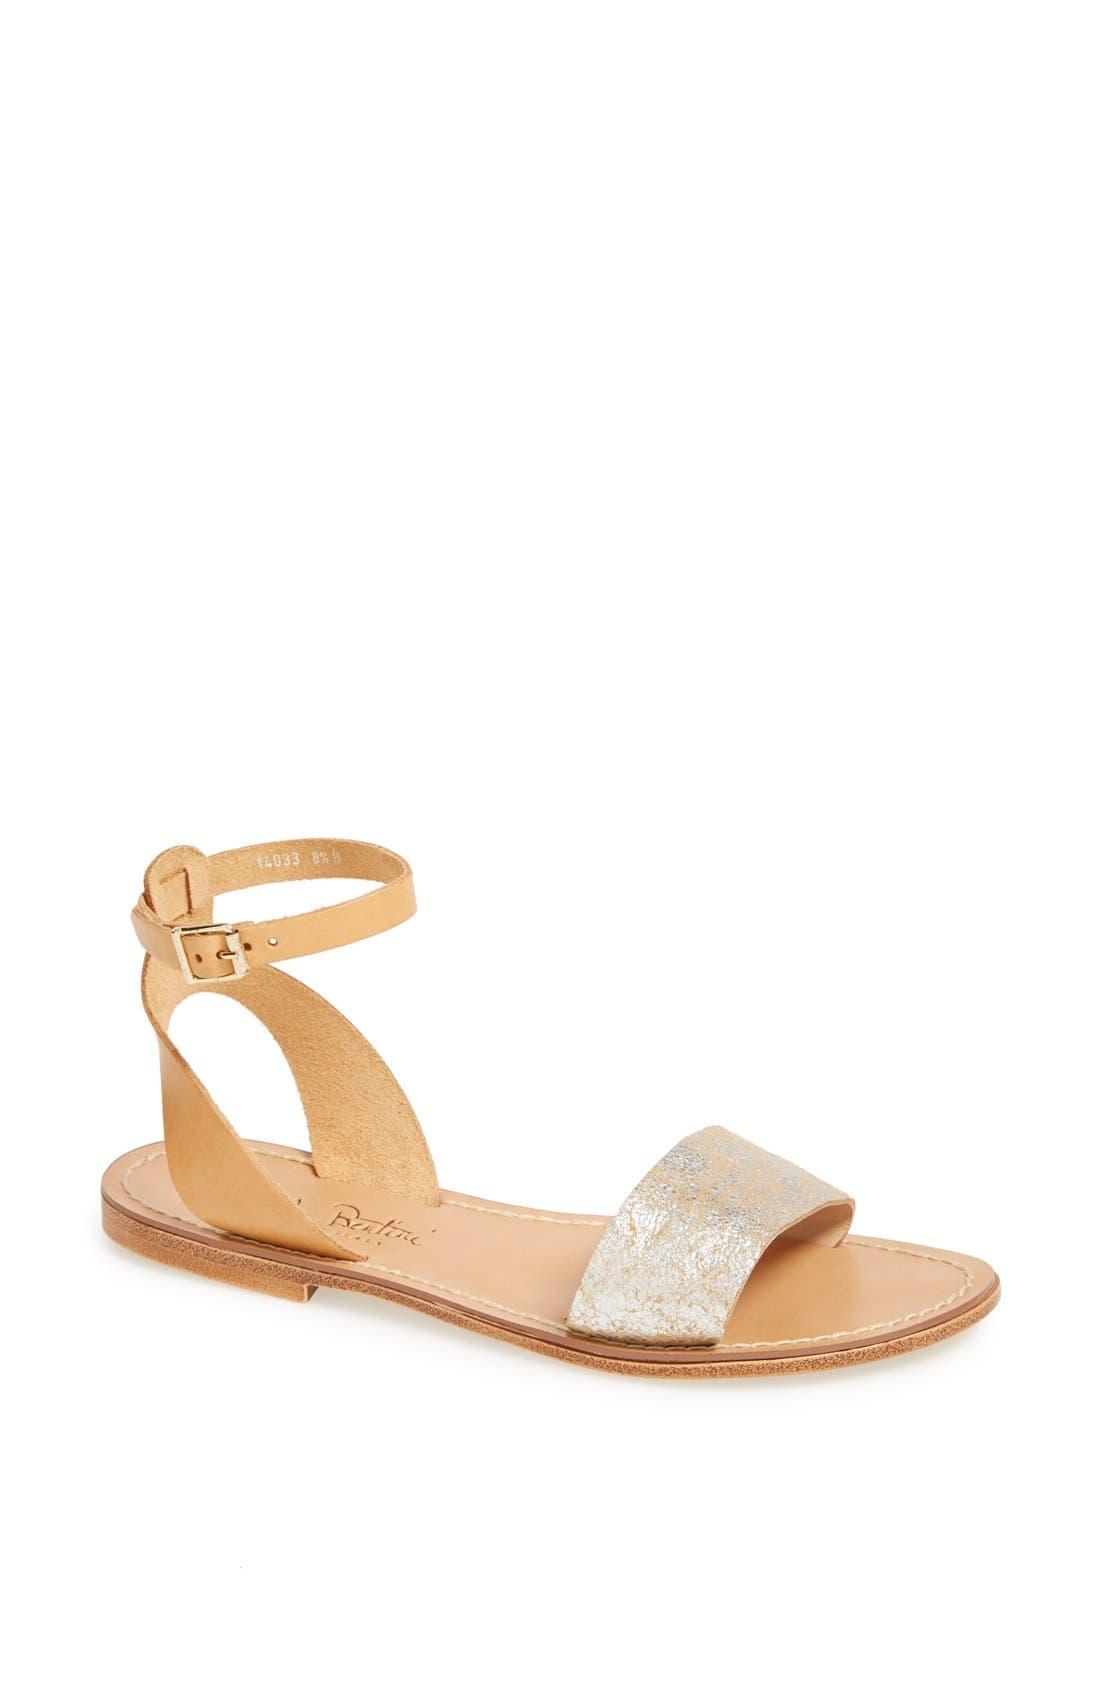 'Sardinia' Sandal, Main, color, 040